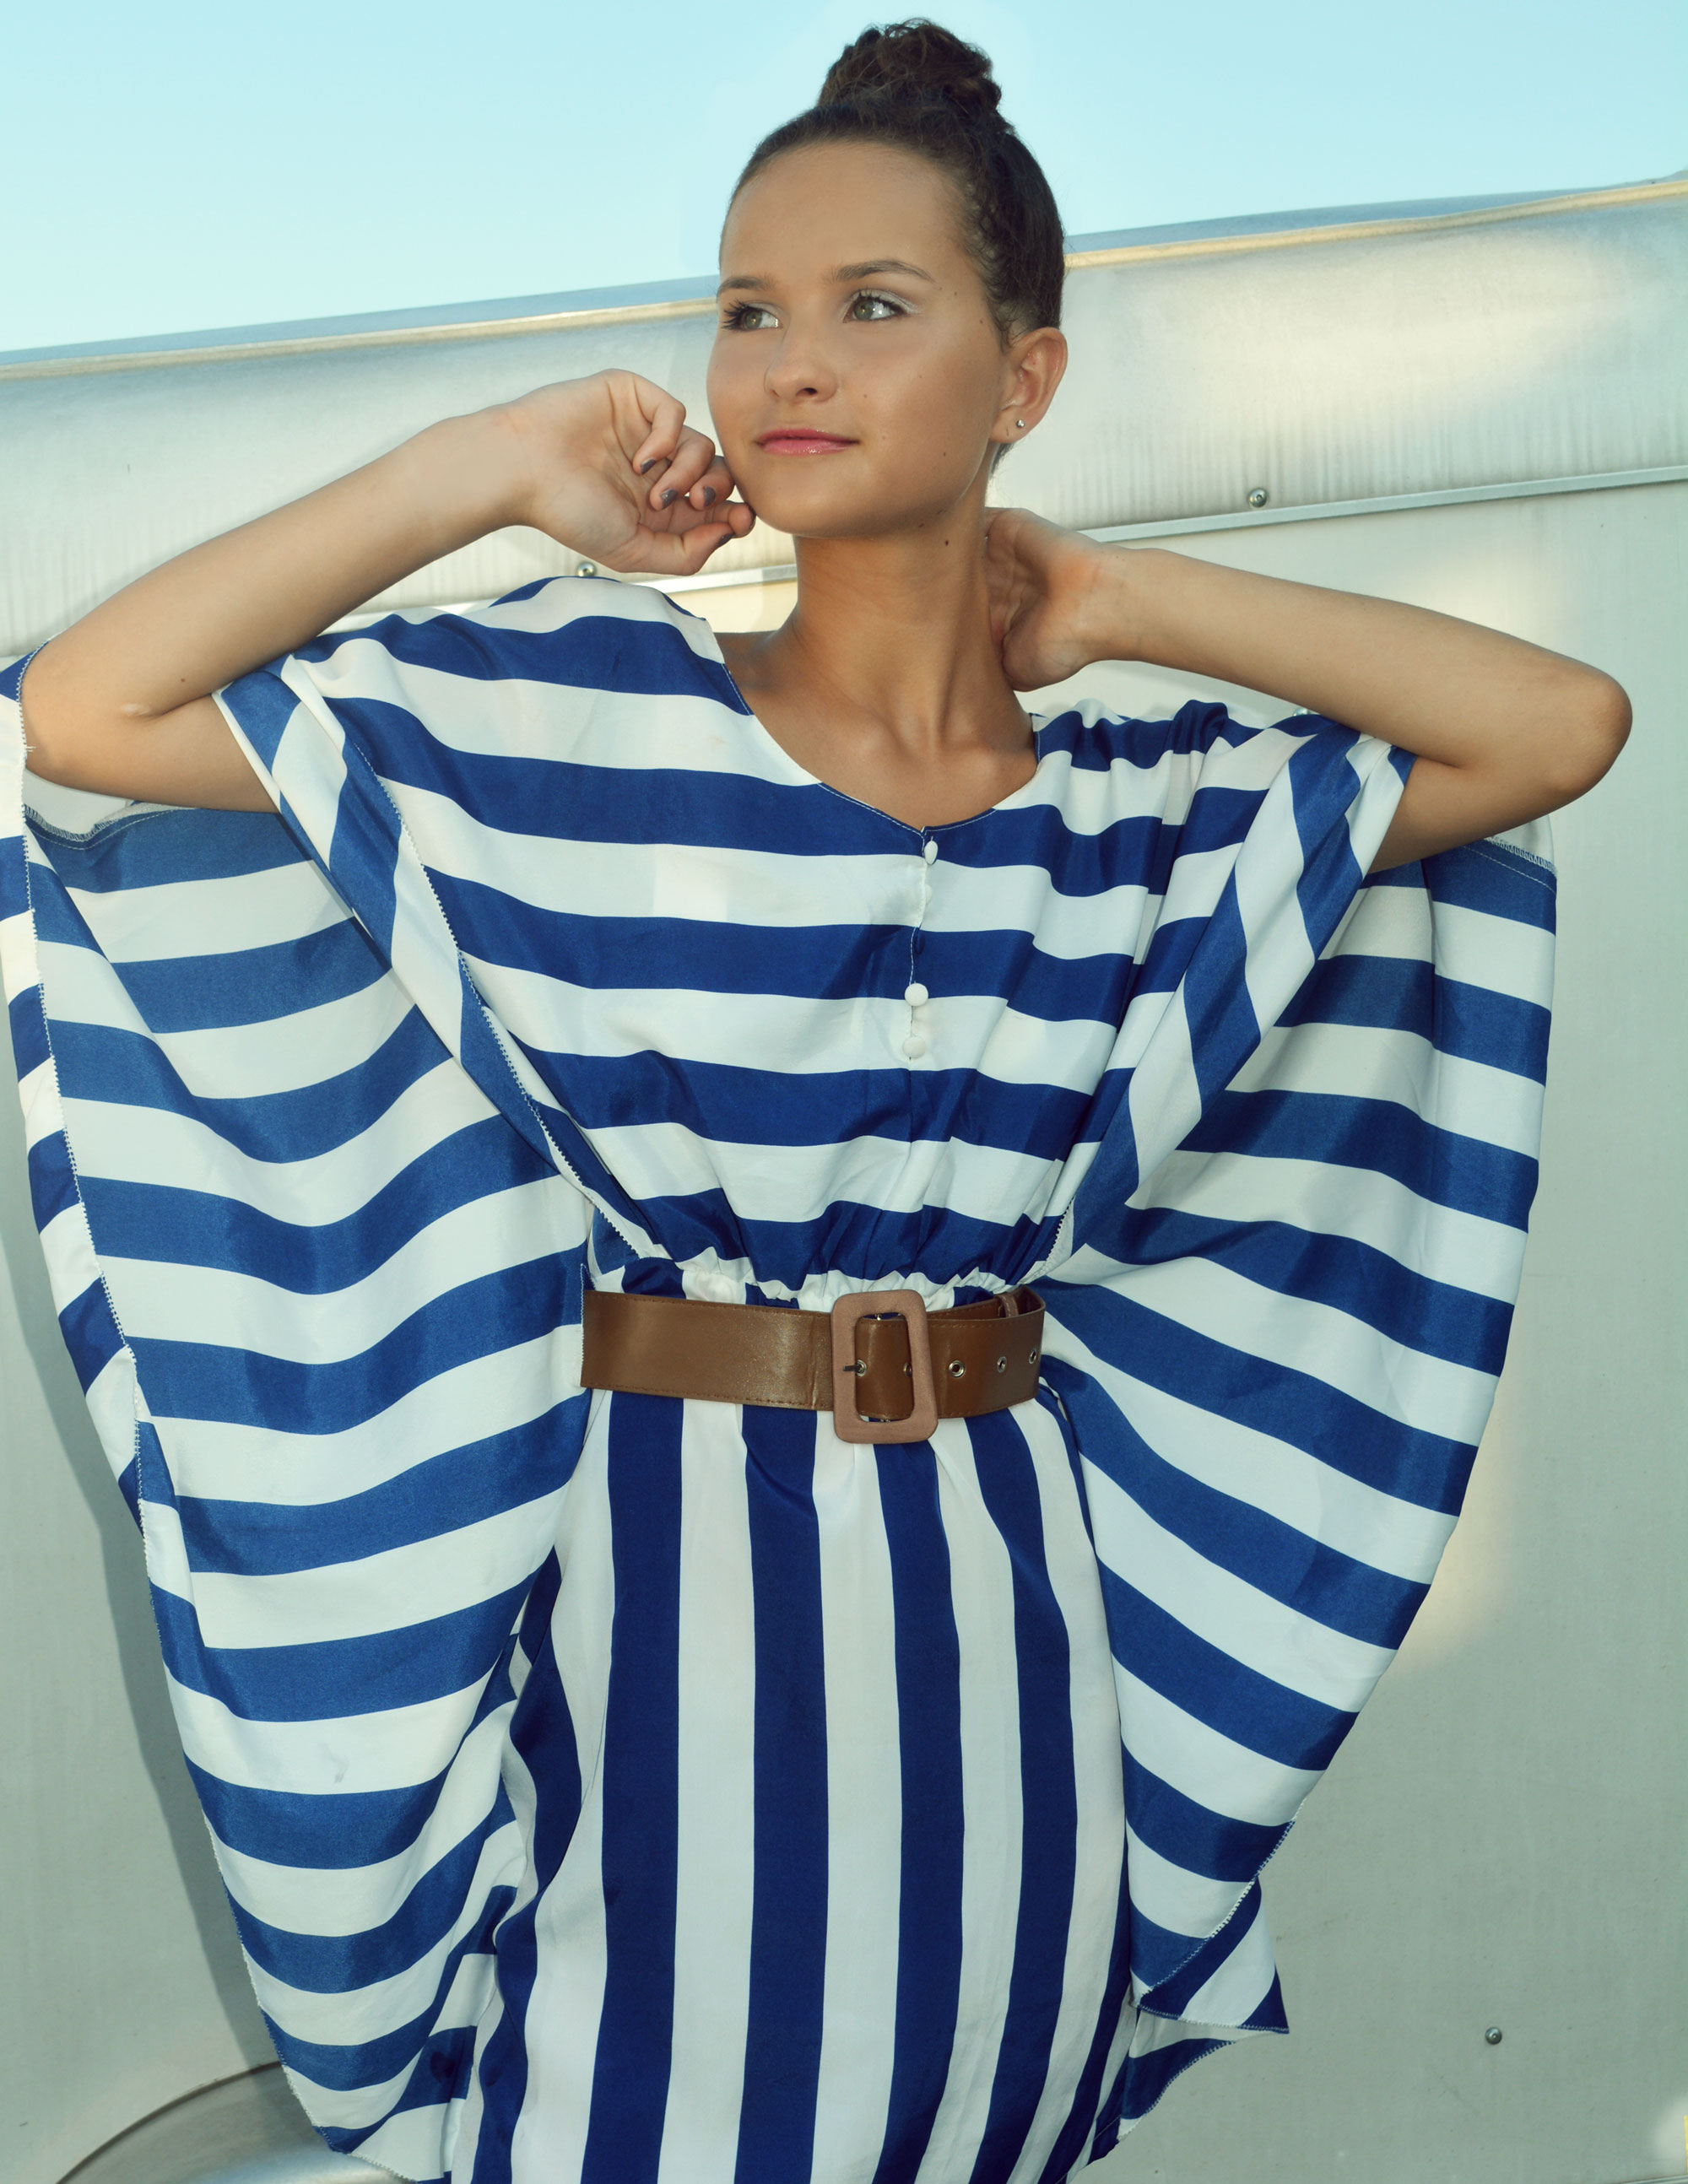 BLue-and-White-Striped-Dress_Abby_Genysis-Salon-WEB.jpg